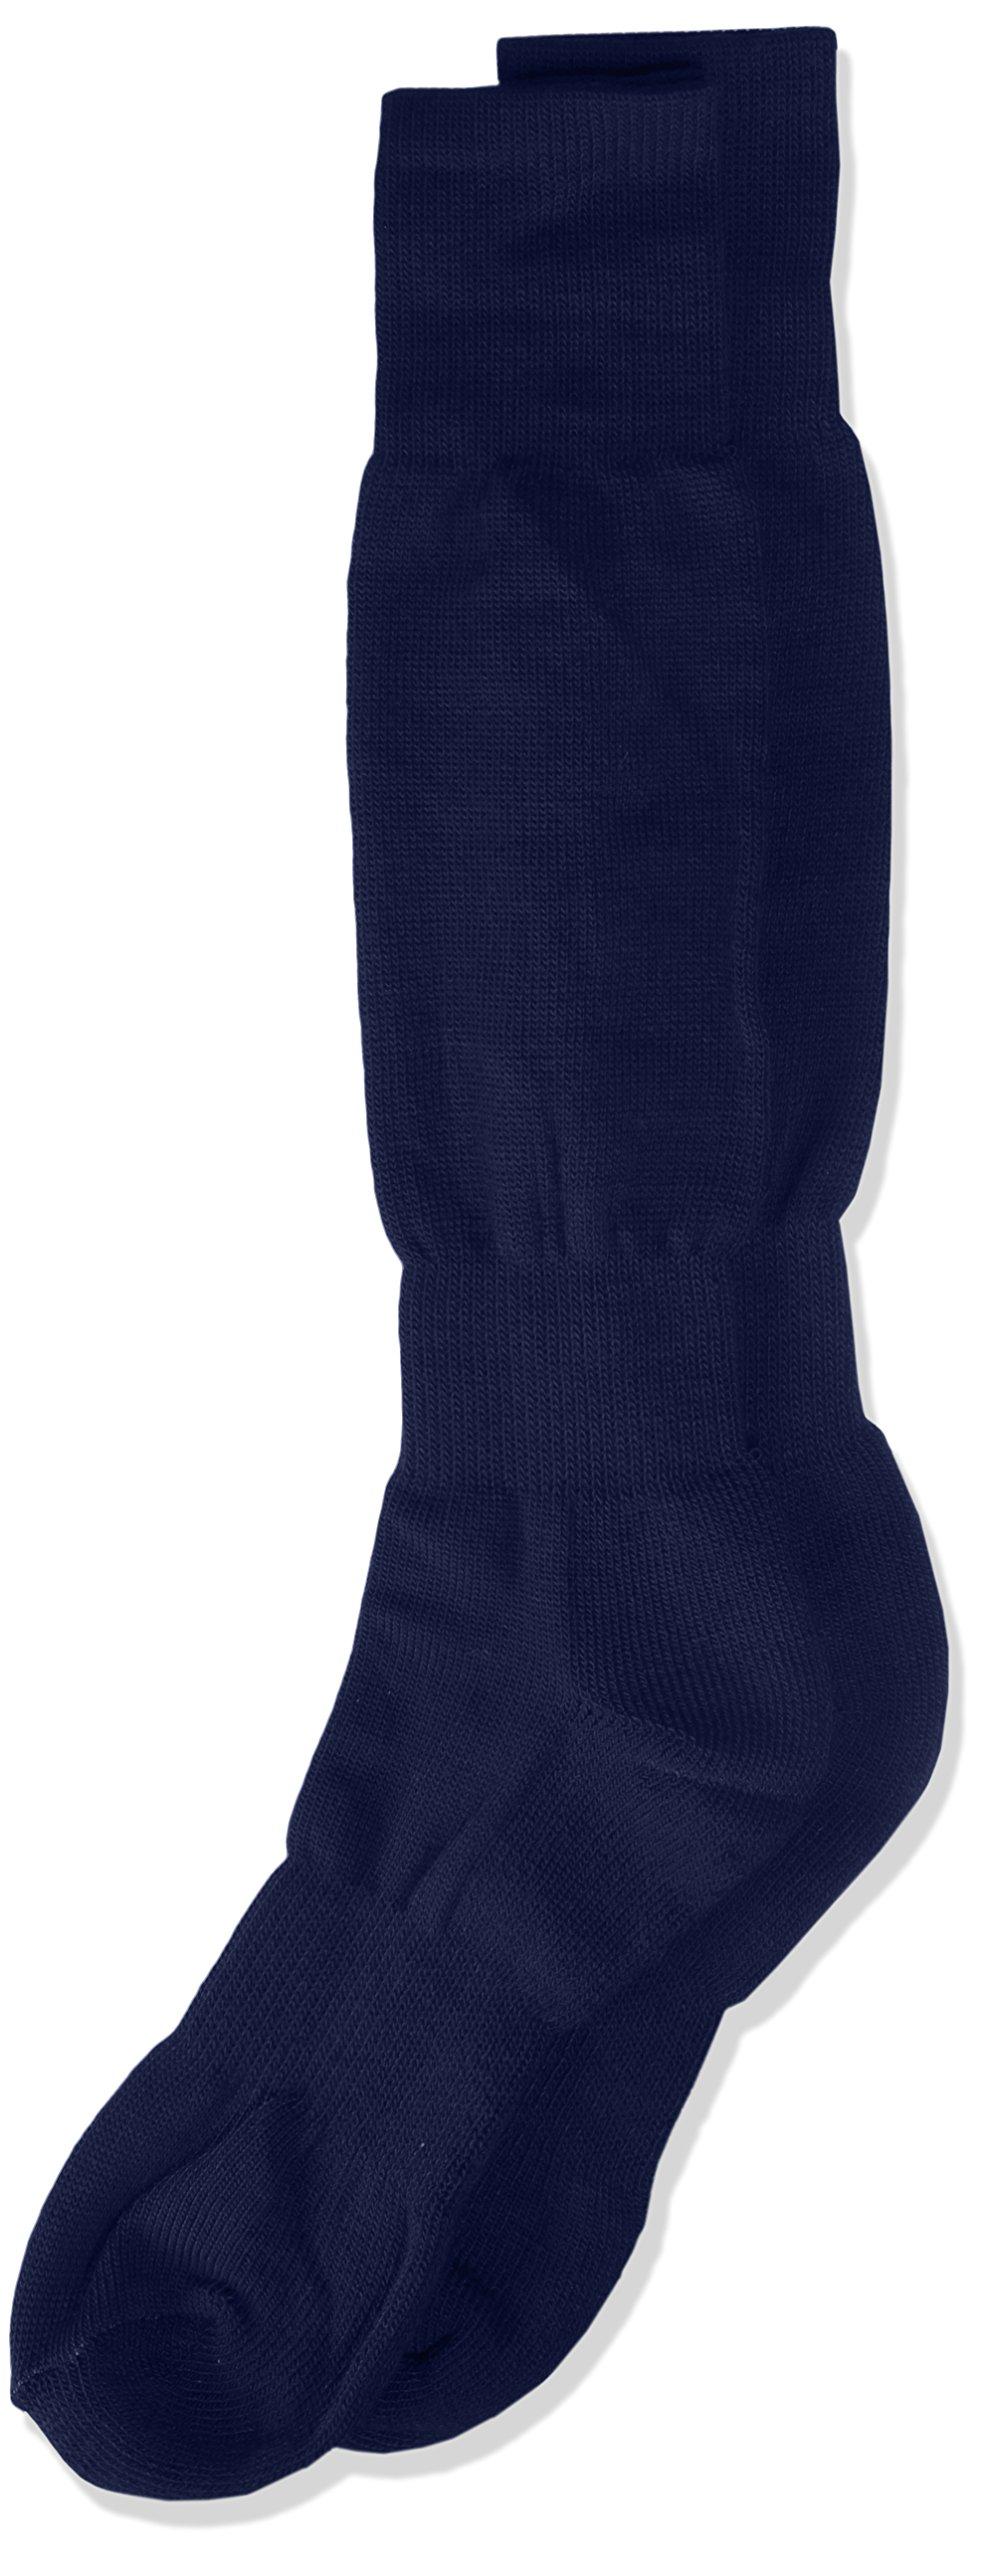 Junior H/T Baseball Socks, Navy, 6-8 1/2'' by TCK